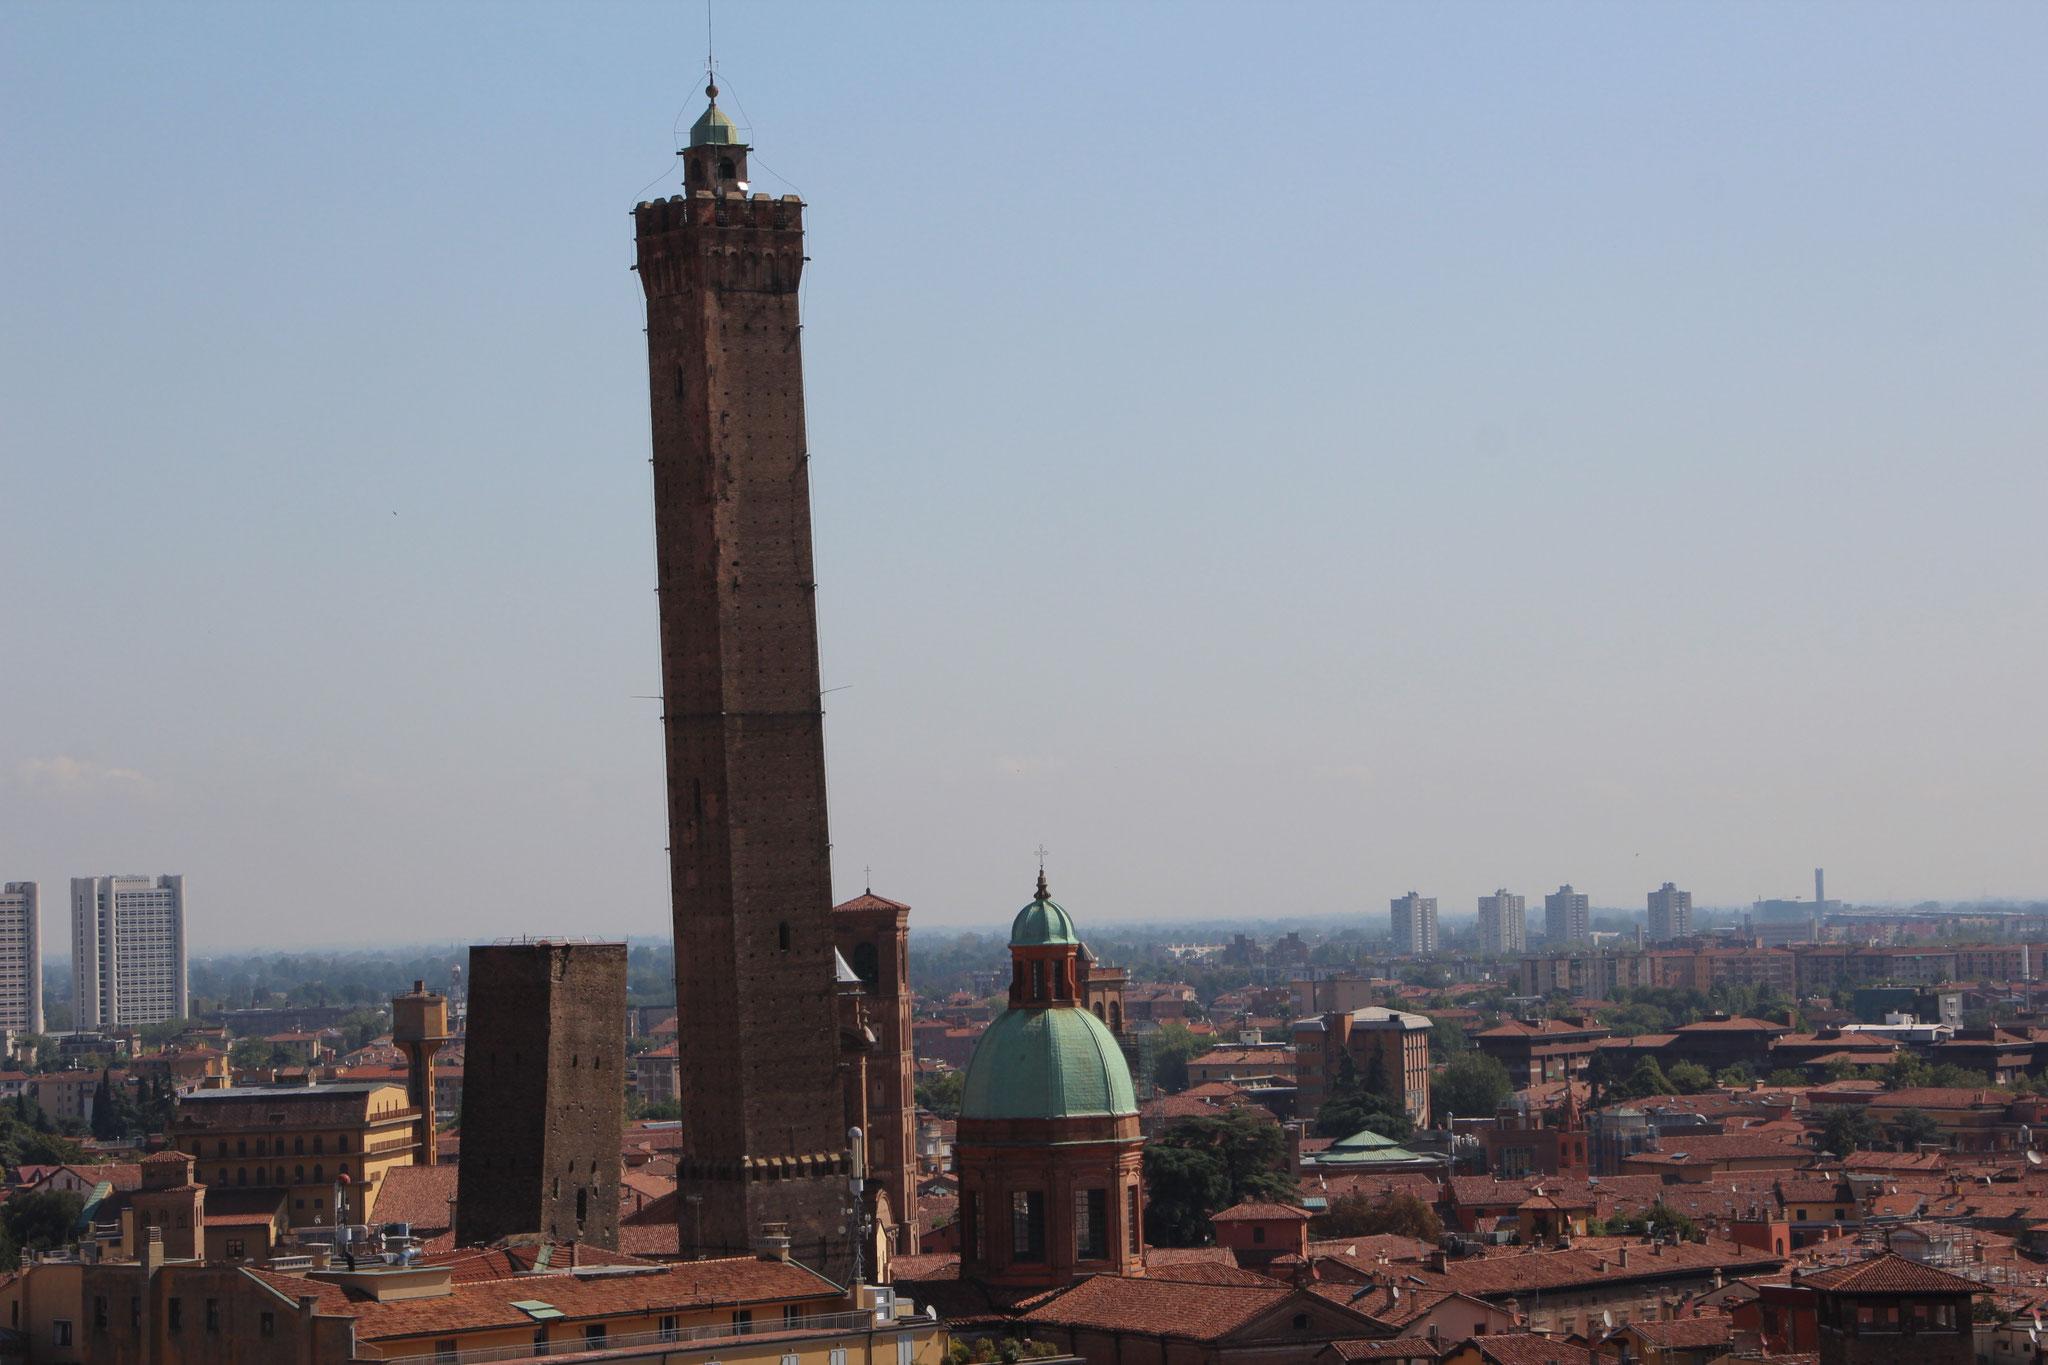 Tours Asinelli et Garisenda, Bologne (1)